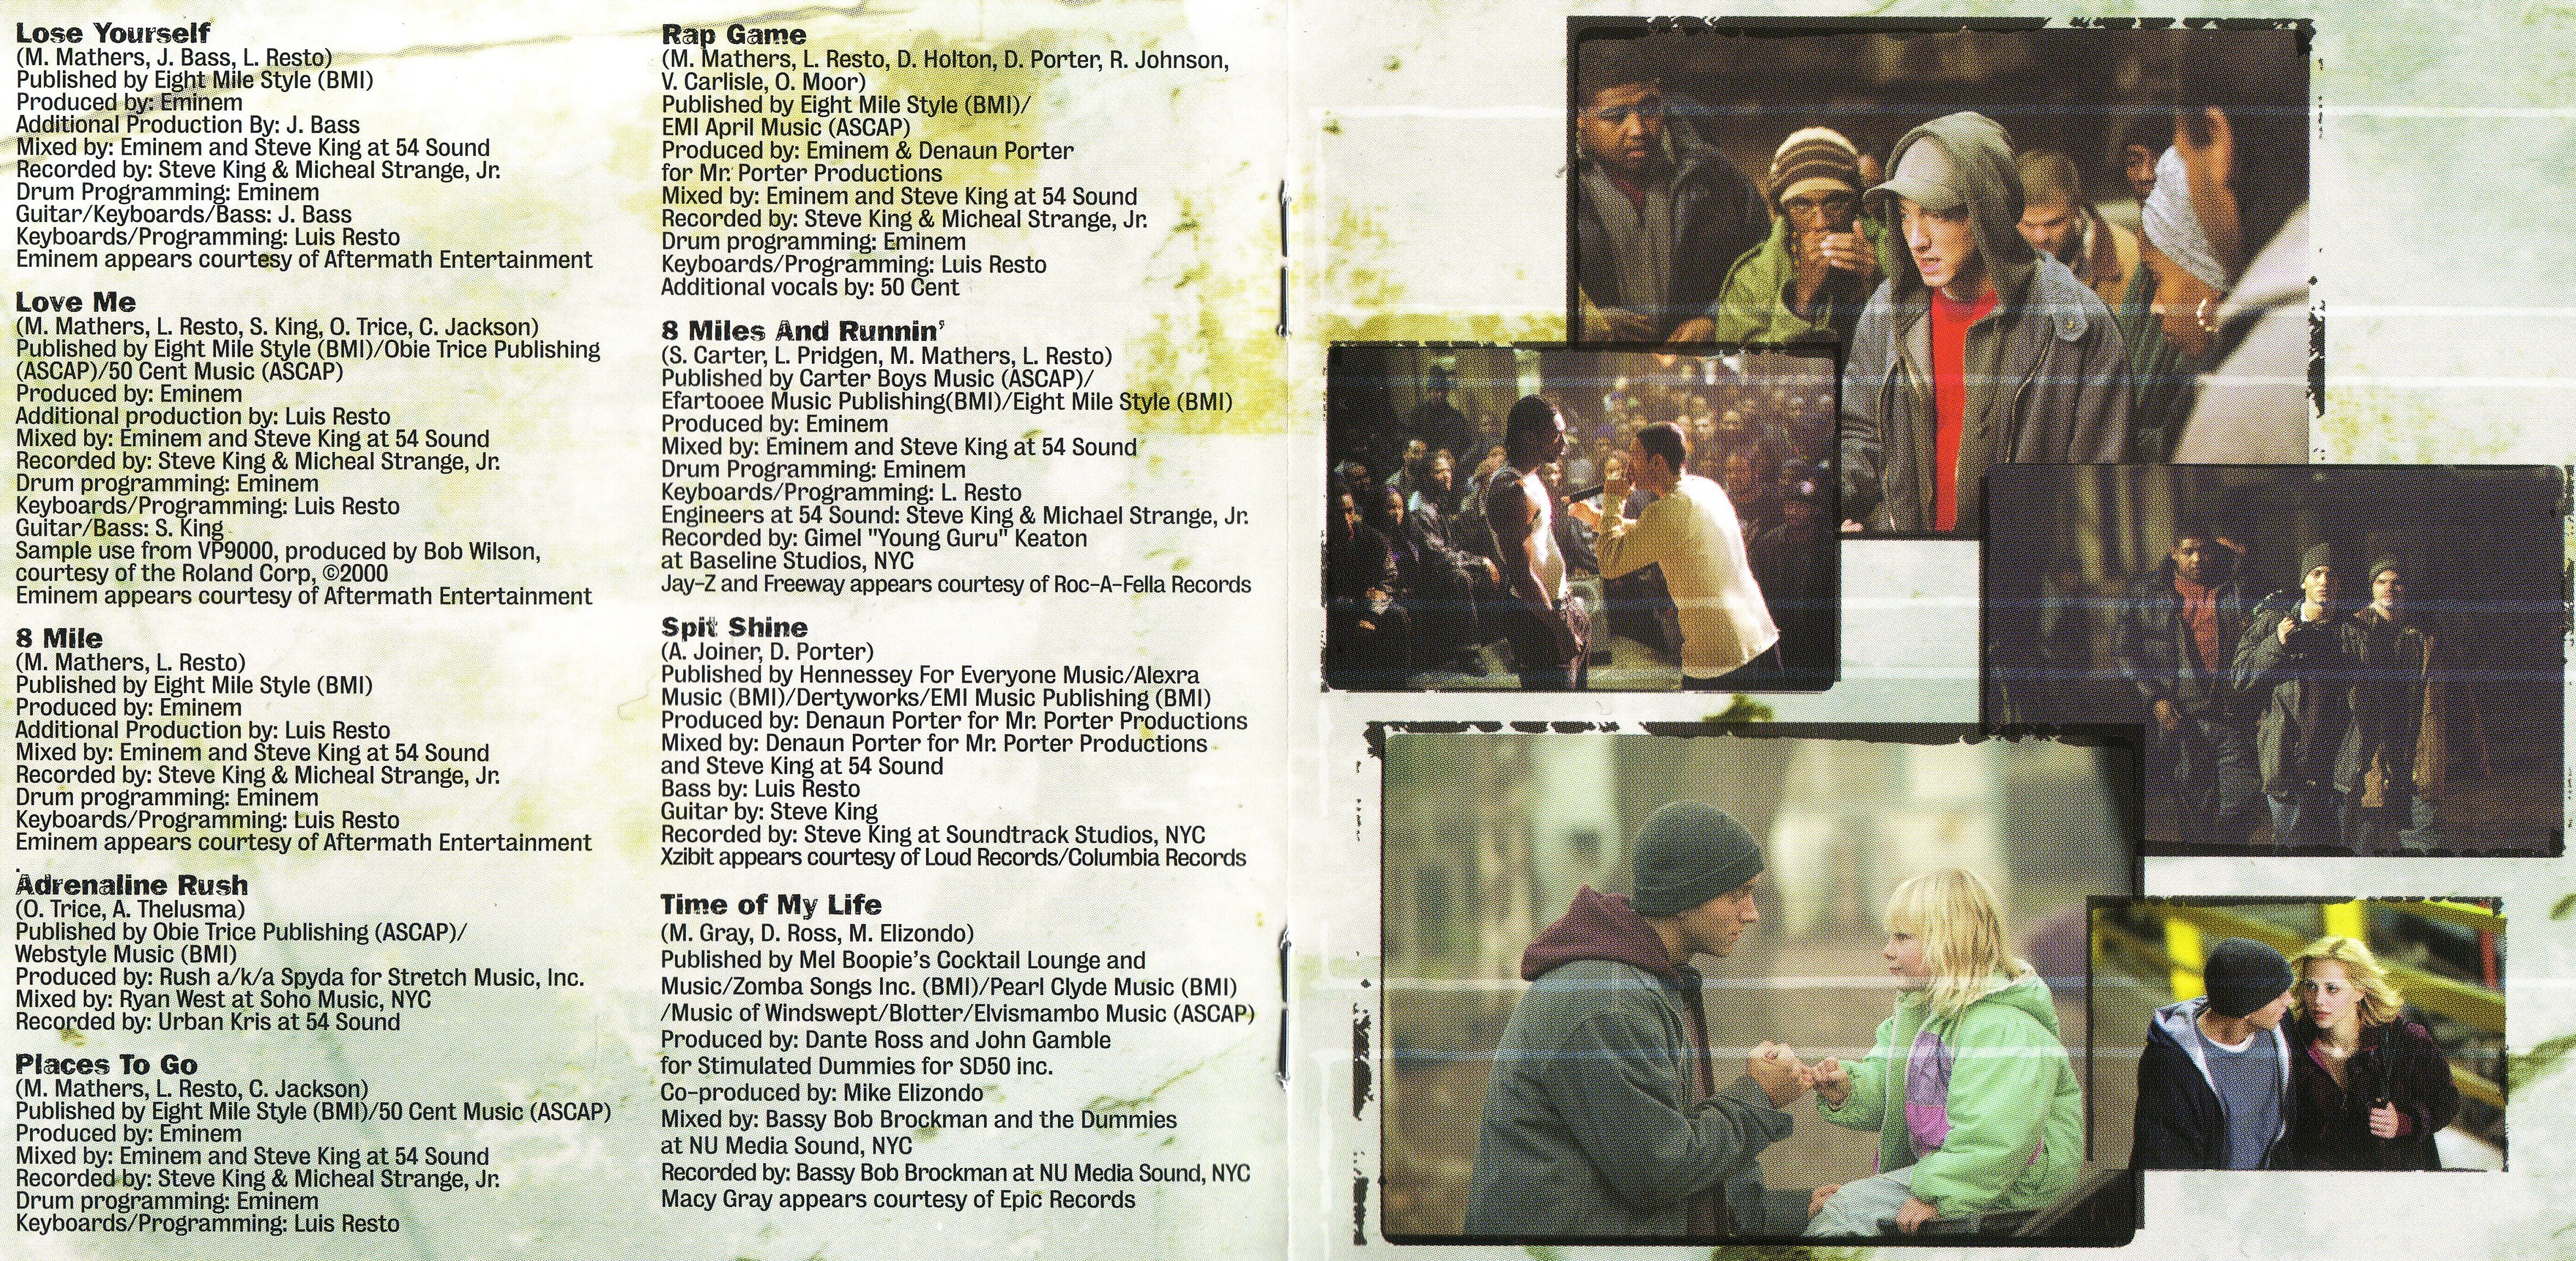 http://www.eminem.pro/wp-content/uploads/2012/03/Booklet-3-4.jpg